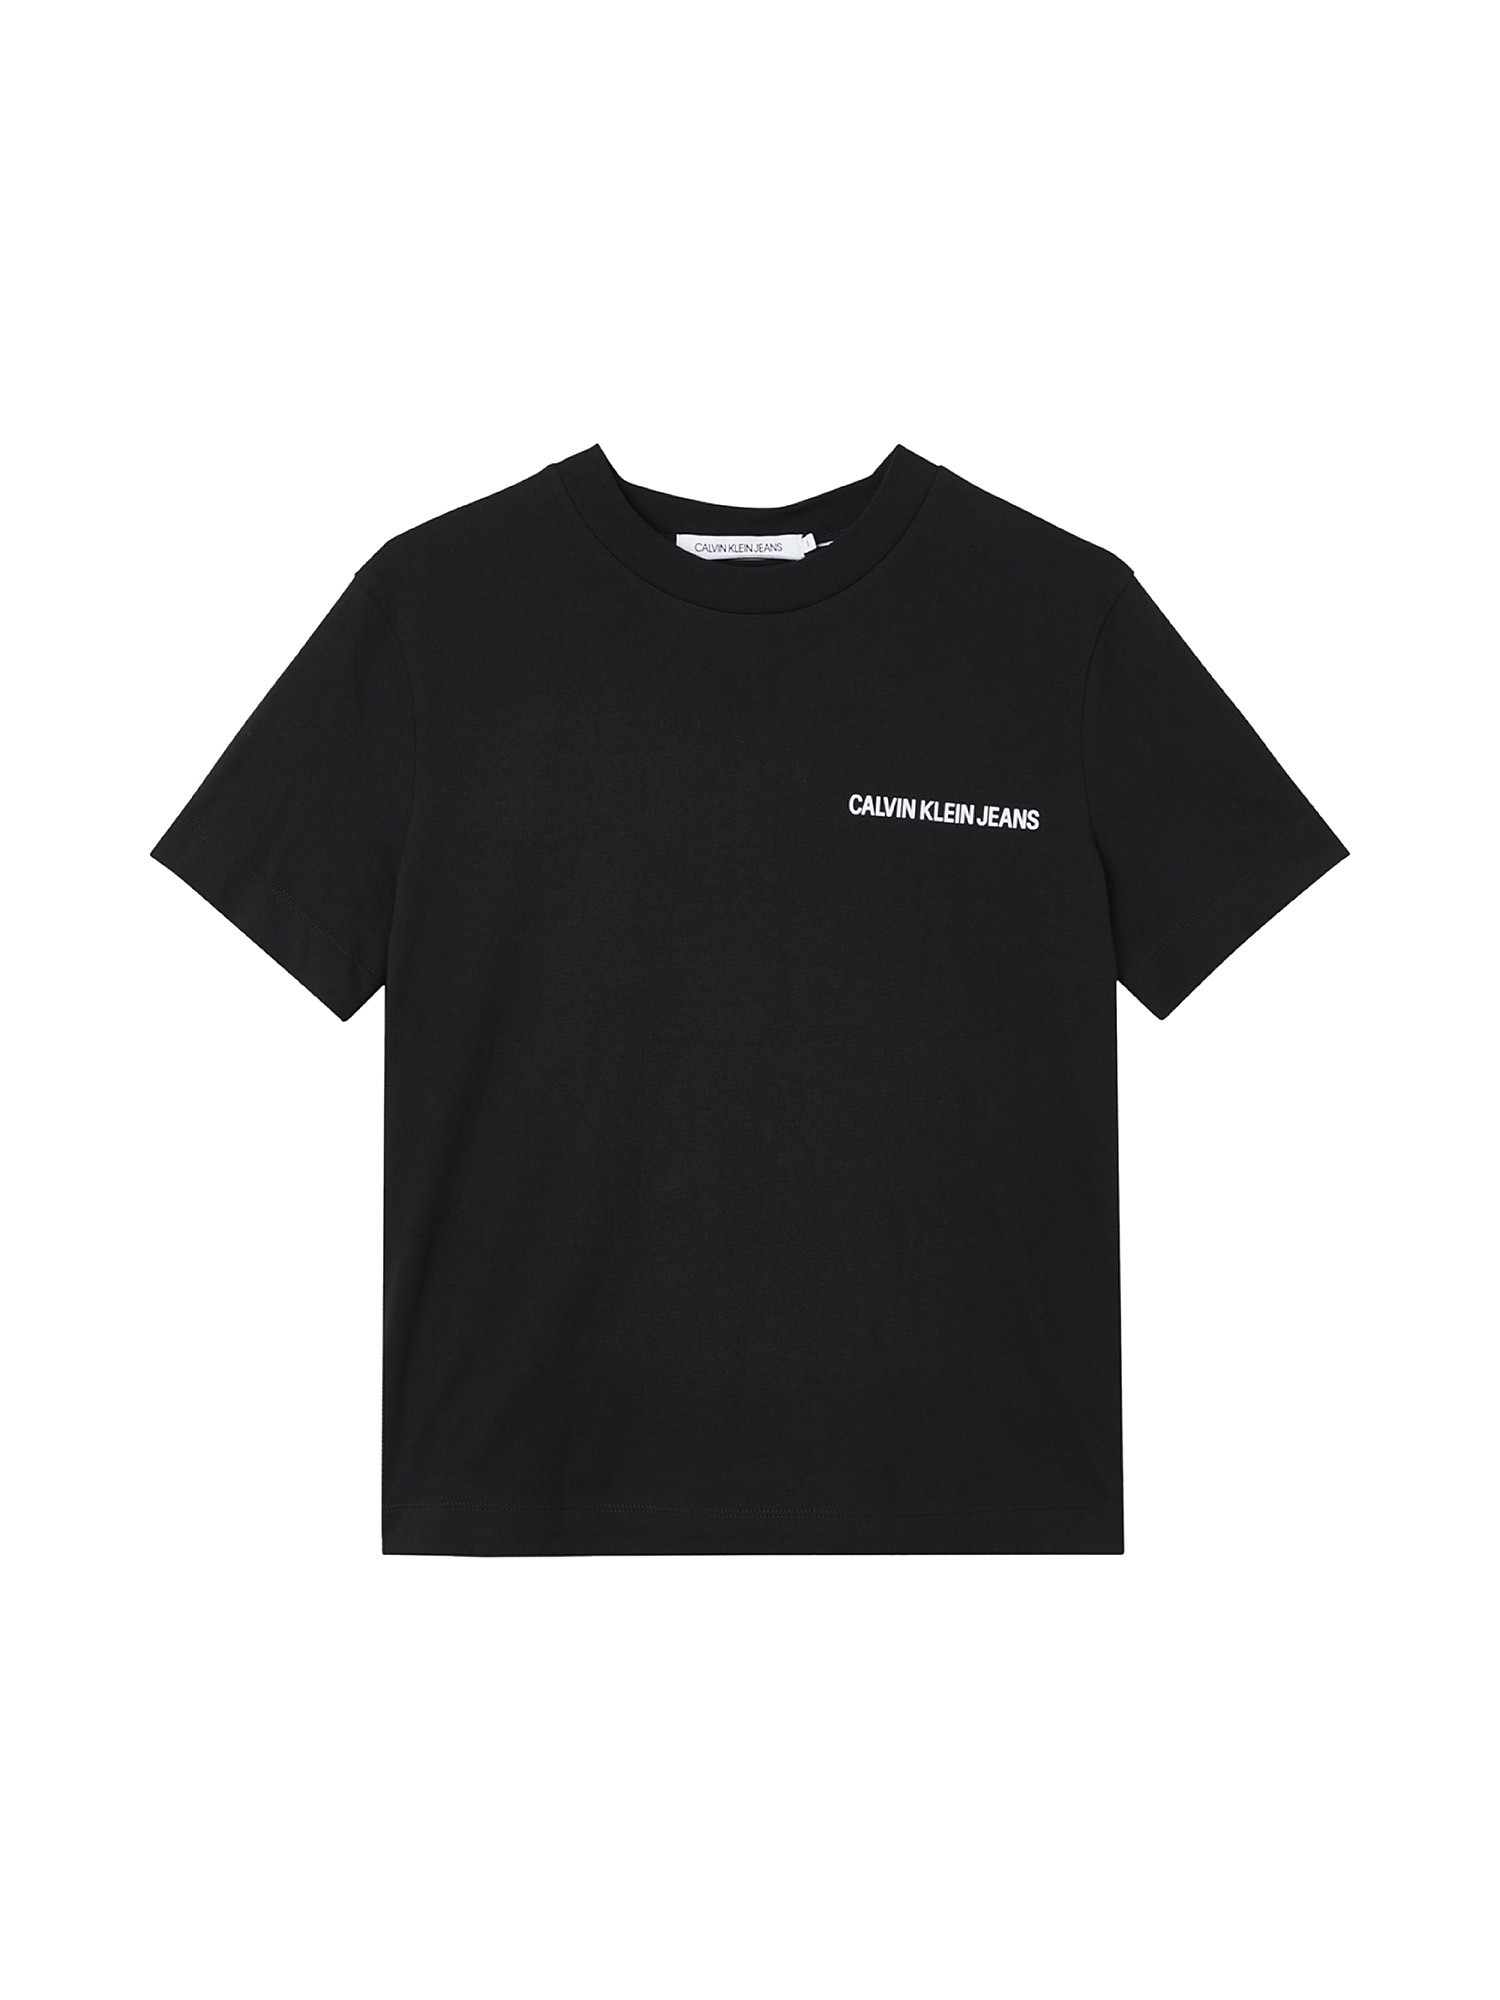 T-shirt in cotone biologico con logo posteriore, Nero, large image number 0